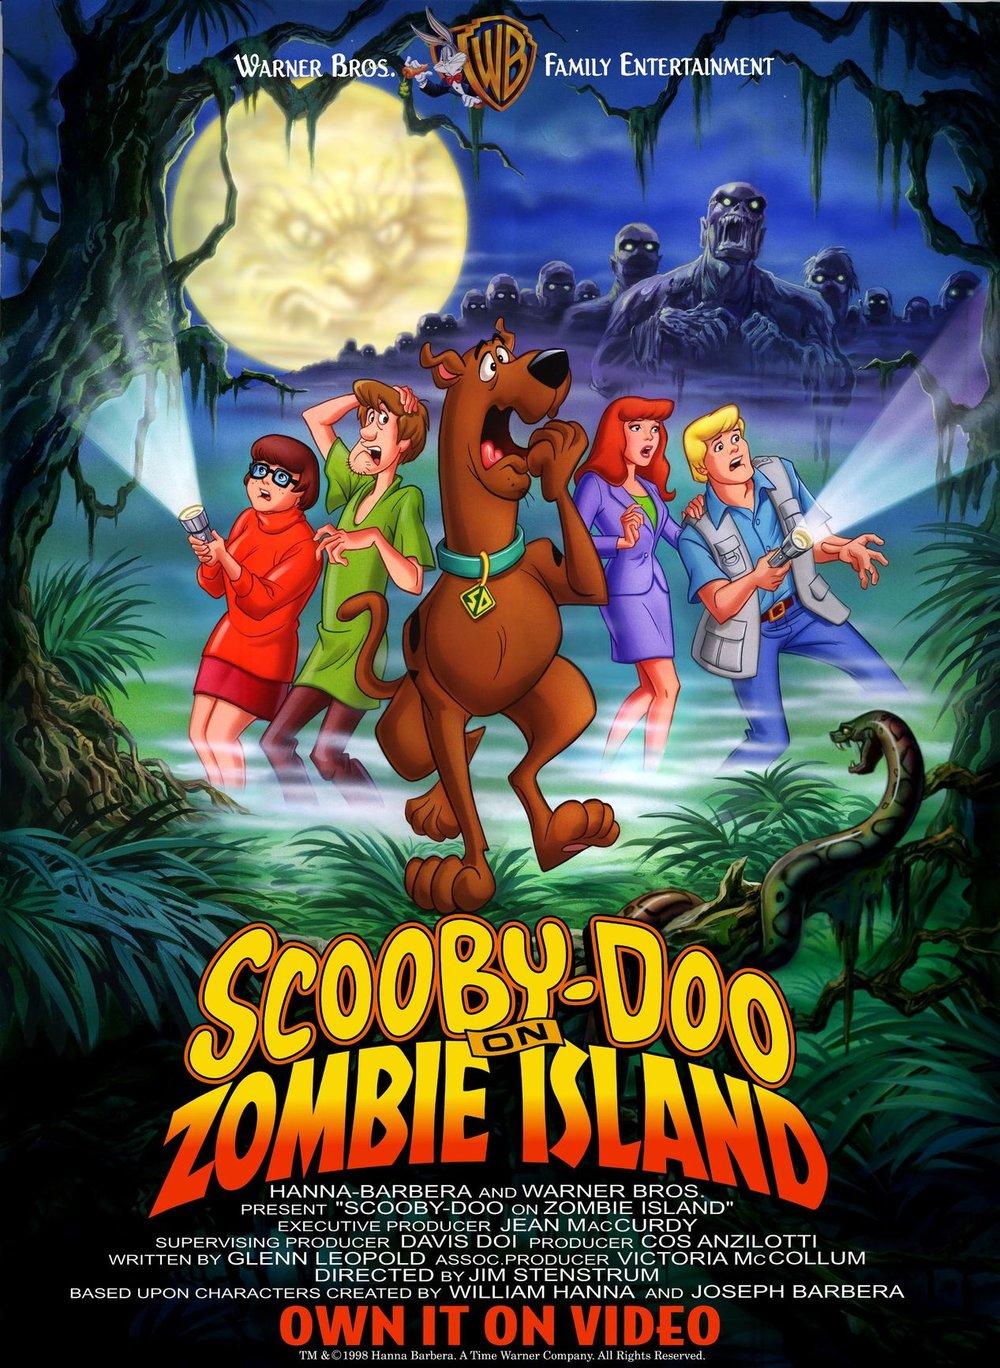 scooby doo on zombie island -